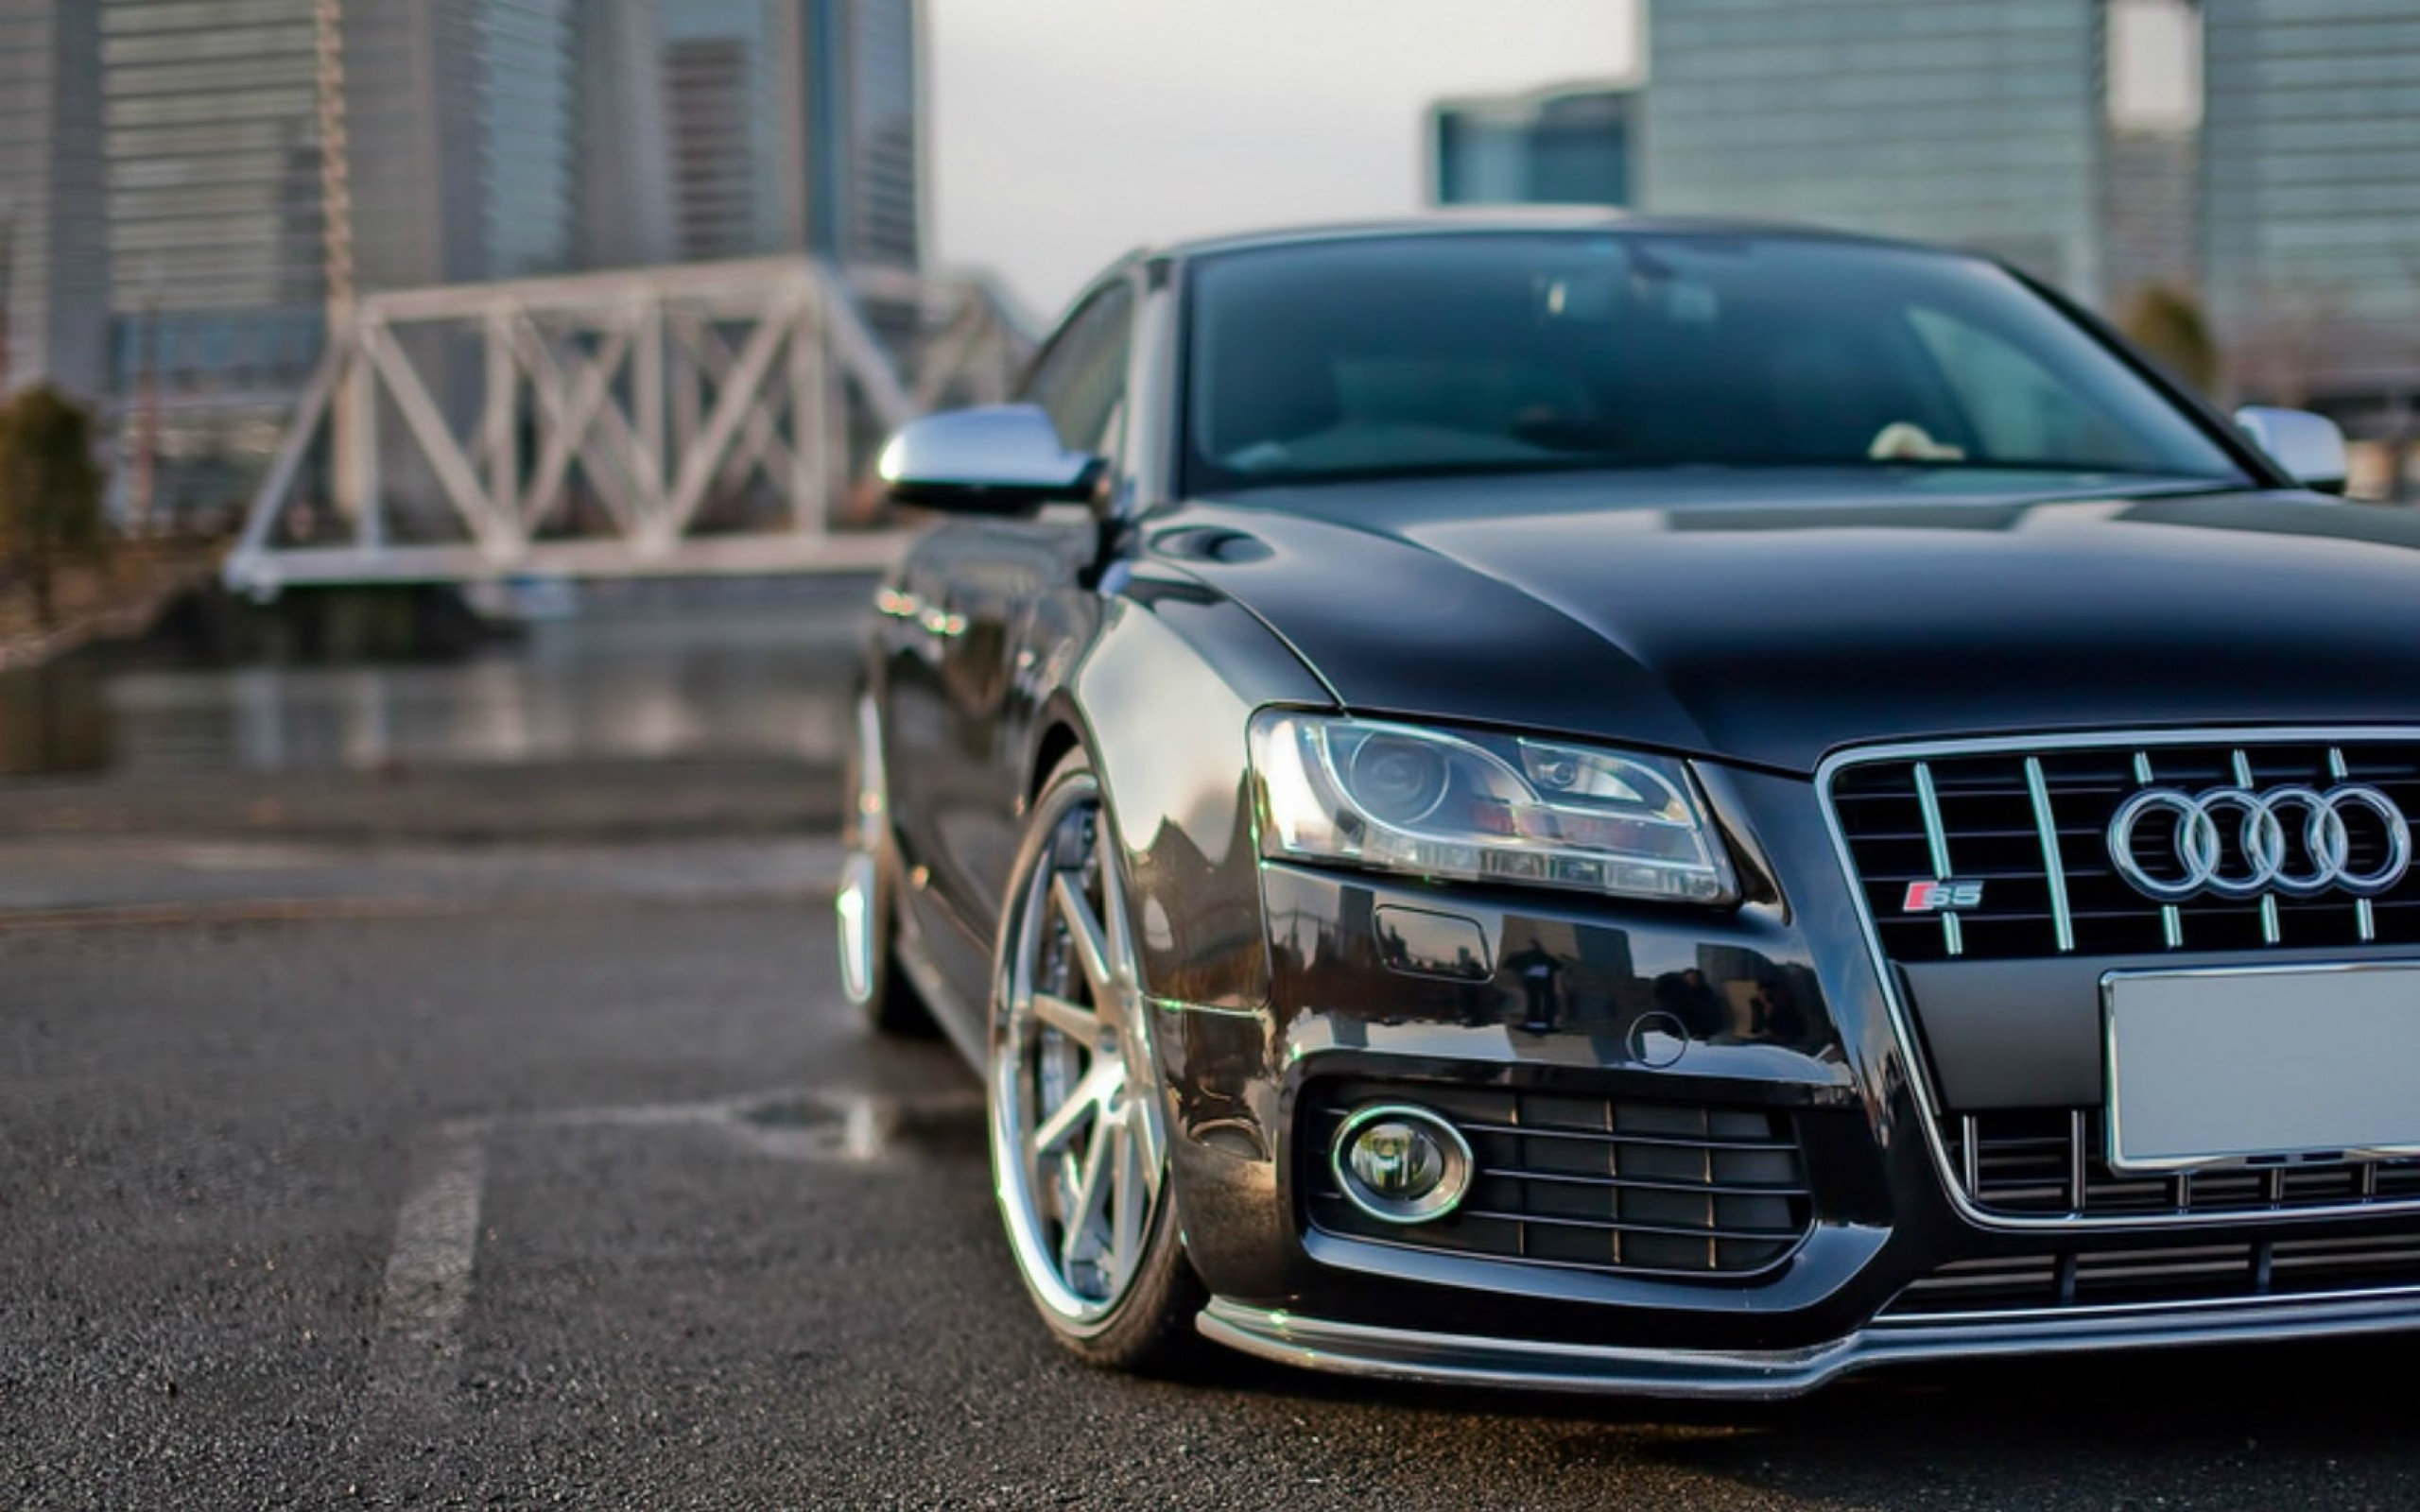 Audi S4 Wallpaper Hd 65 Images